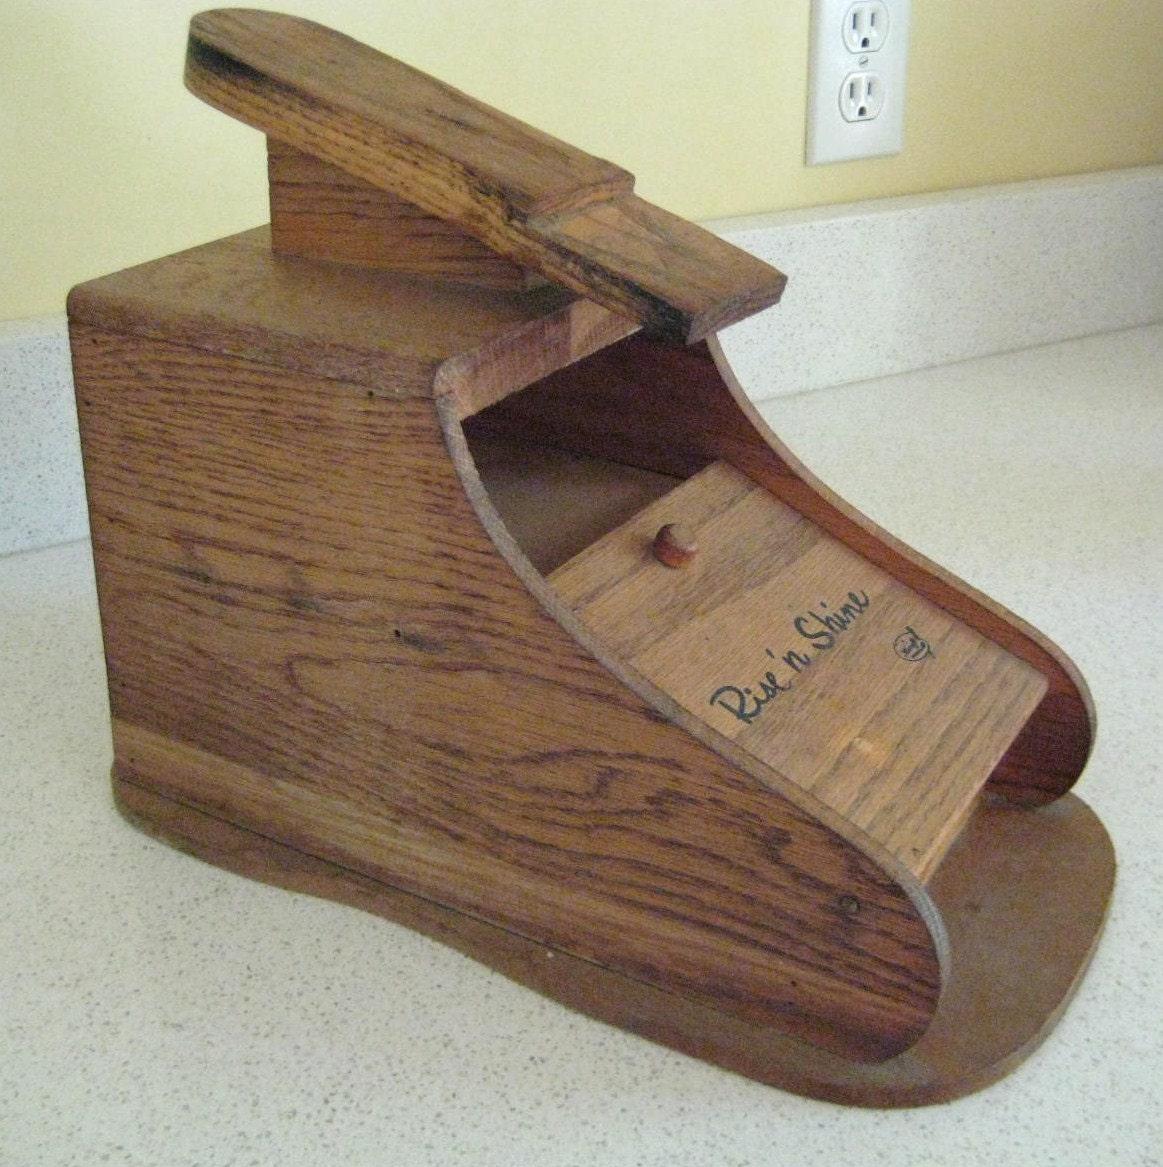 Vintage Wooden Shoe Shine Box Rise and Shine by Karoff